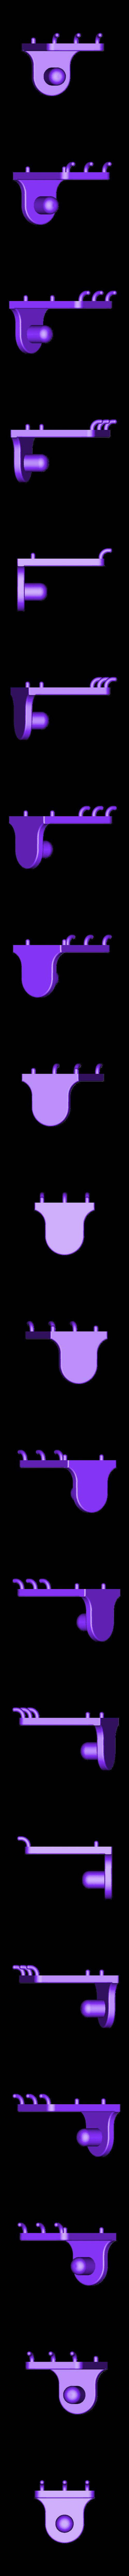 Pins.stl Download free STL file Universal Wall Holder for 1/2 inch sockets 044 I for screws or peg board • 3D printer design, Wiesemann1893